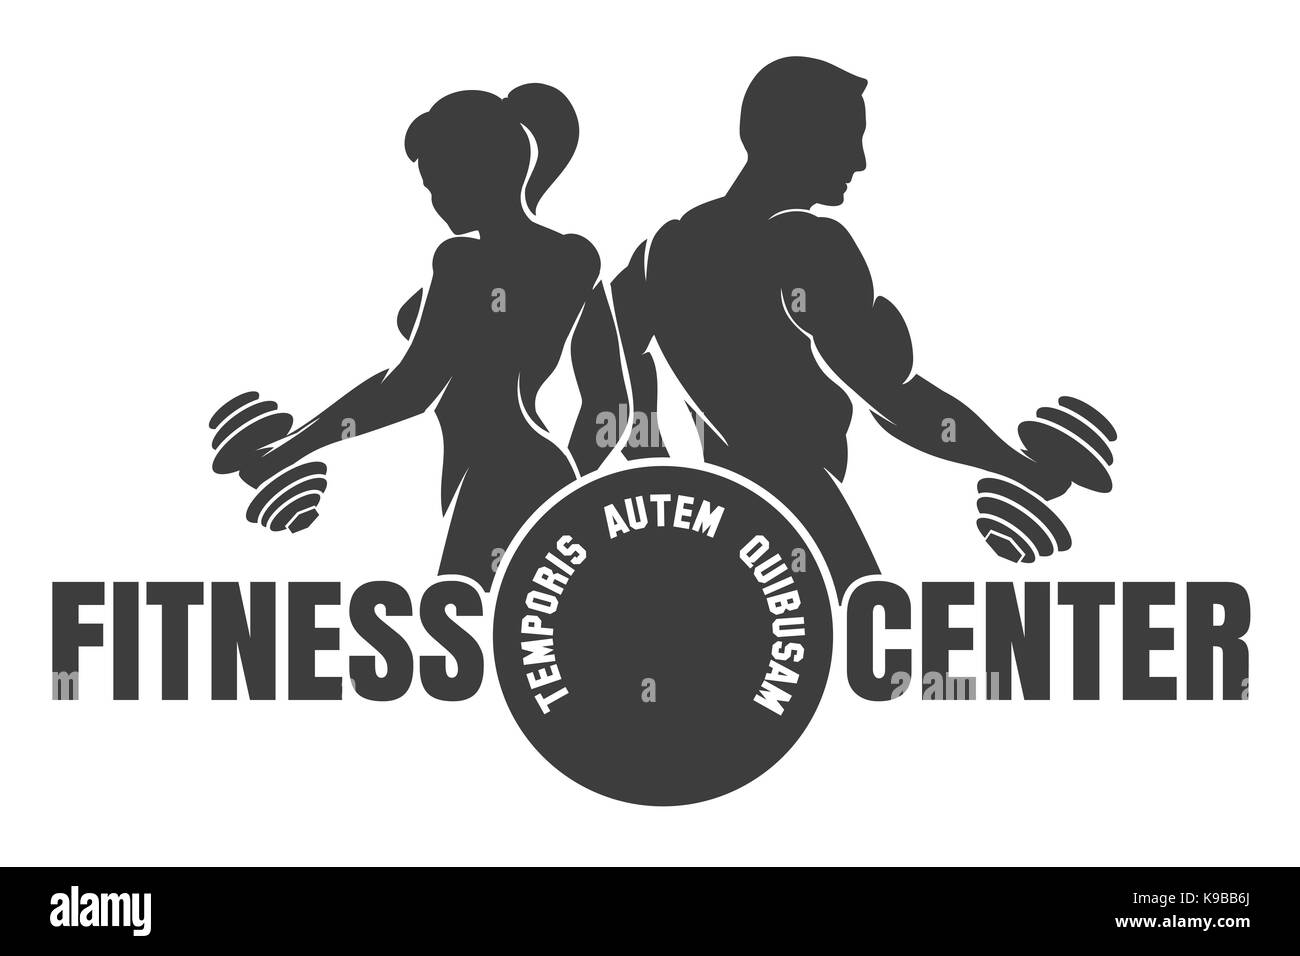 bodybuilding logo stock photos amp bodybuilding logo stock